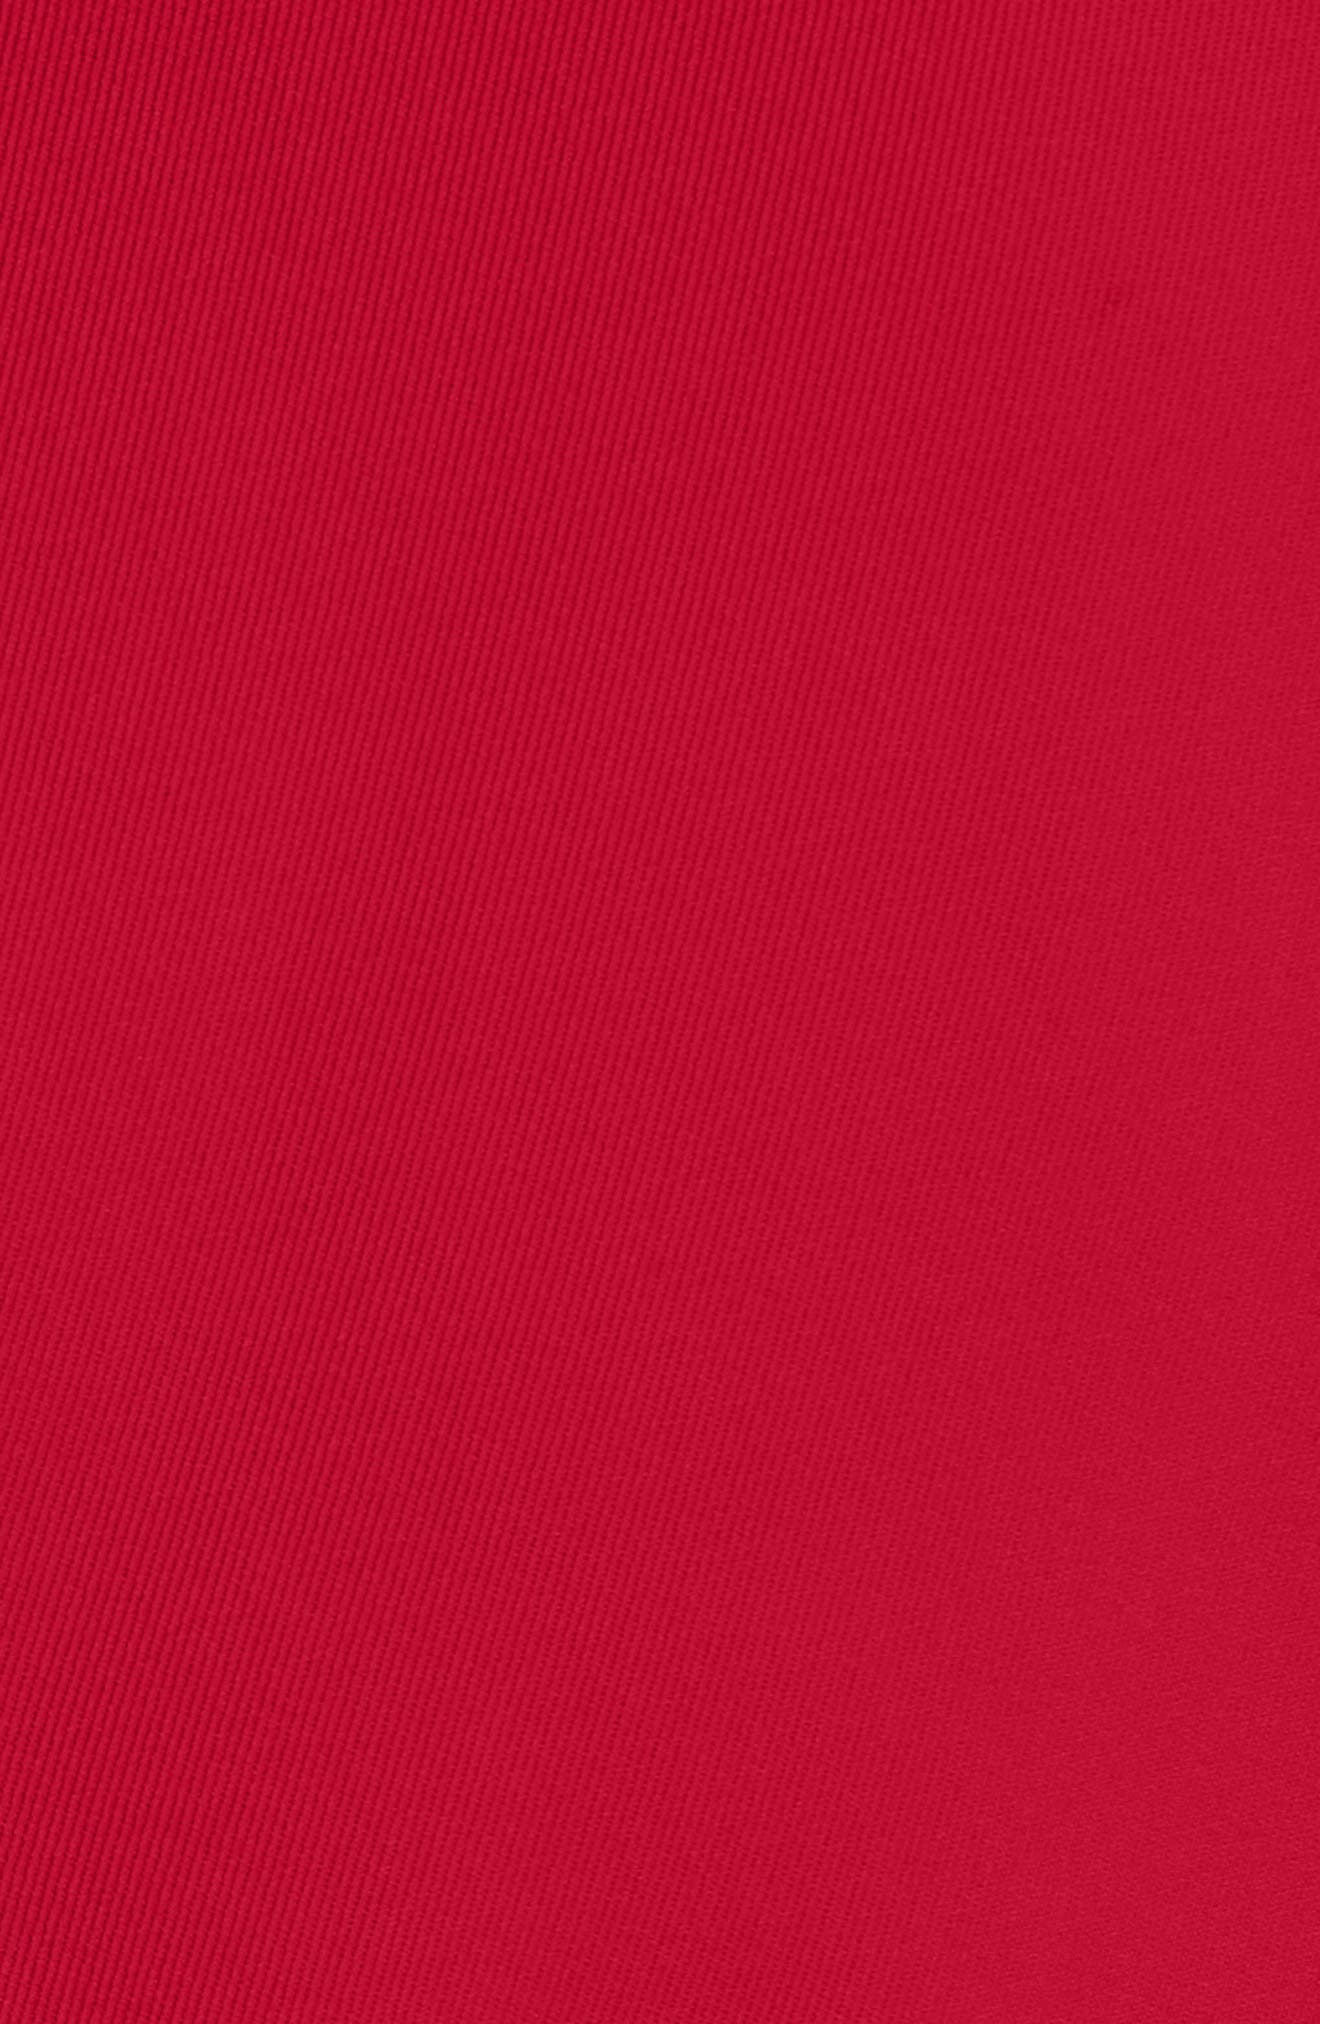 MONCLER, Bauges Water Repellent Hooded Down Coat with Detachable Genuine Fox Fur Trim, Alternate thumbnail 6, color, RED